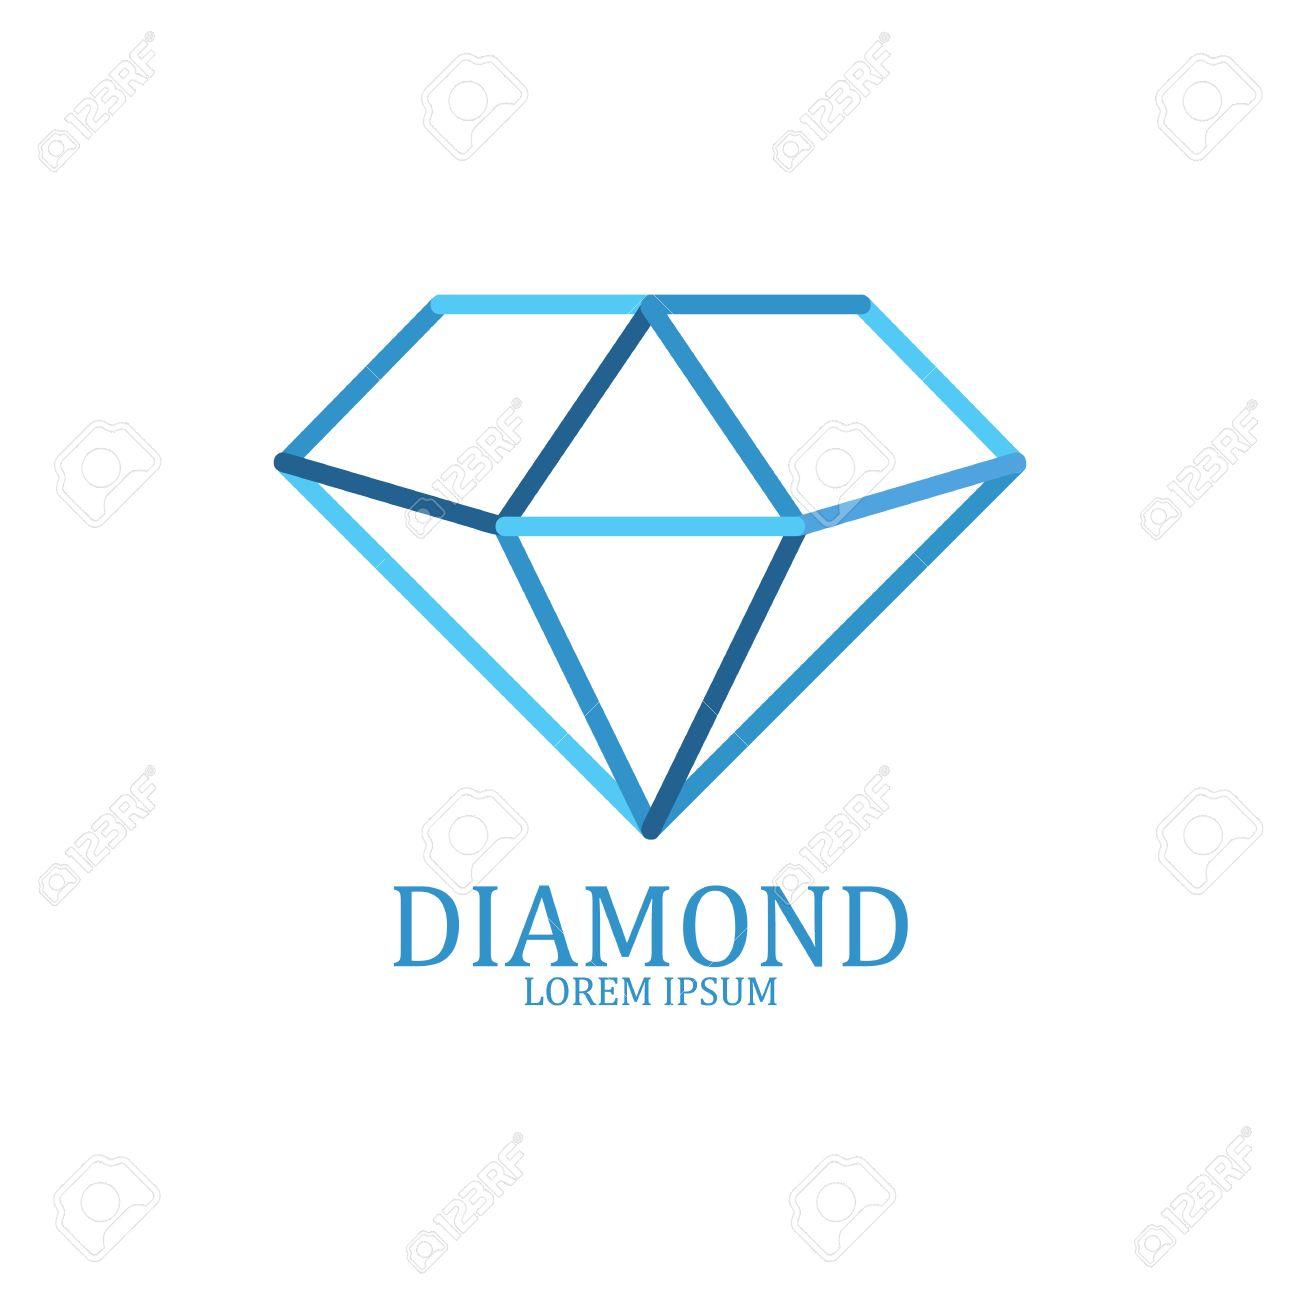 Diamond logo isolated. Brilliant gemstone sign. Vector illustration - 55755799